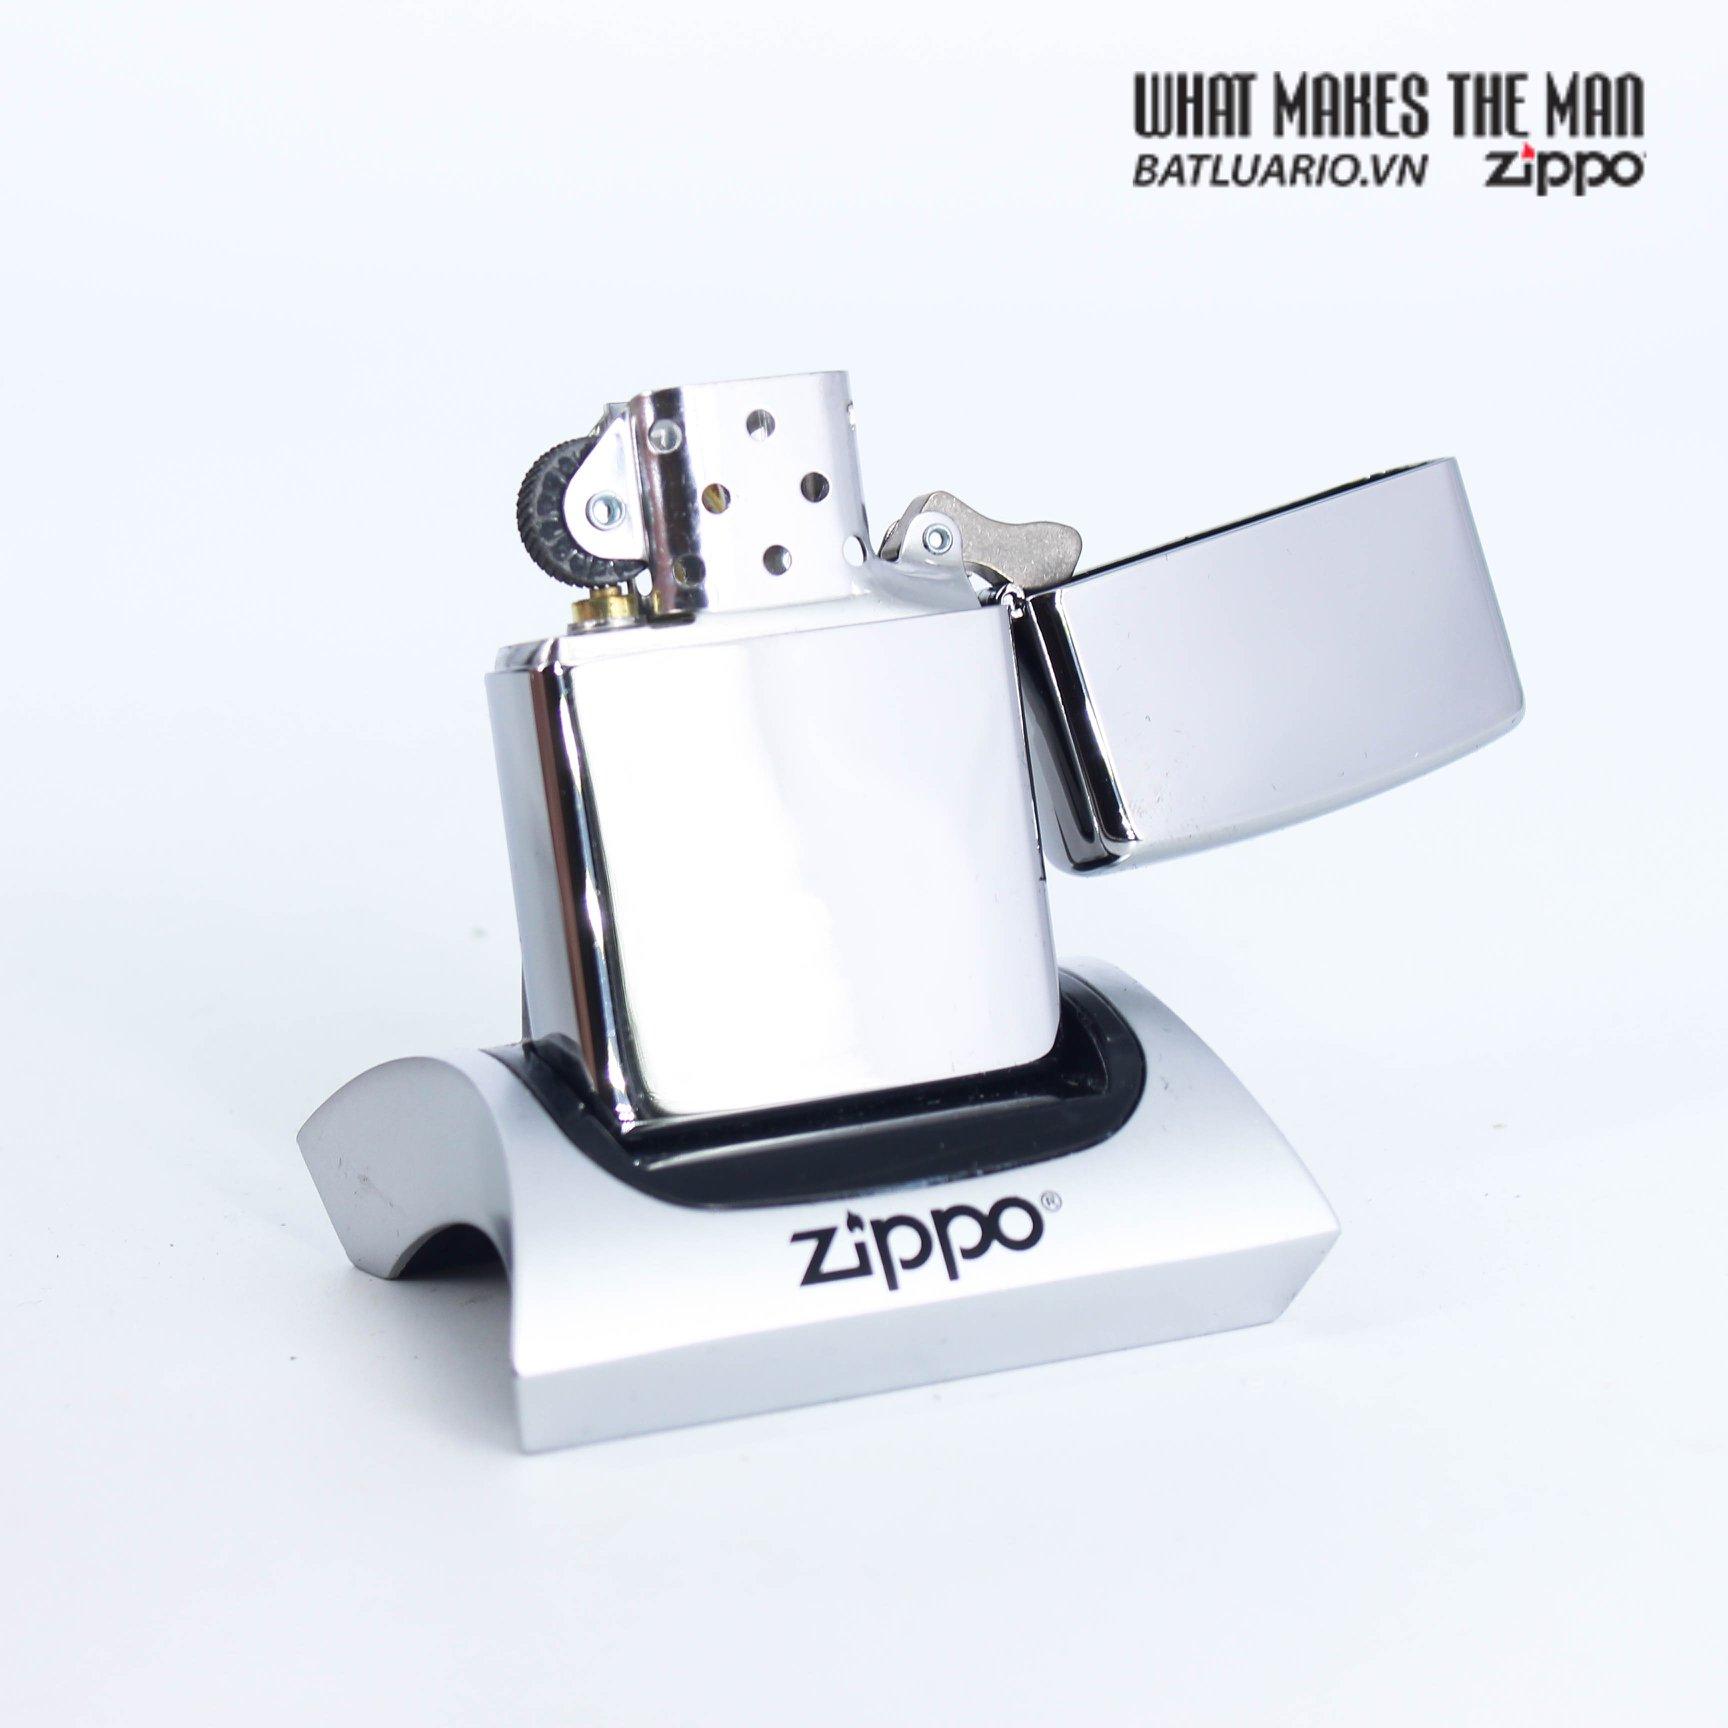 Zippo 49129 - Zippo Etched Freedom Design High Polish Chrome 3